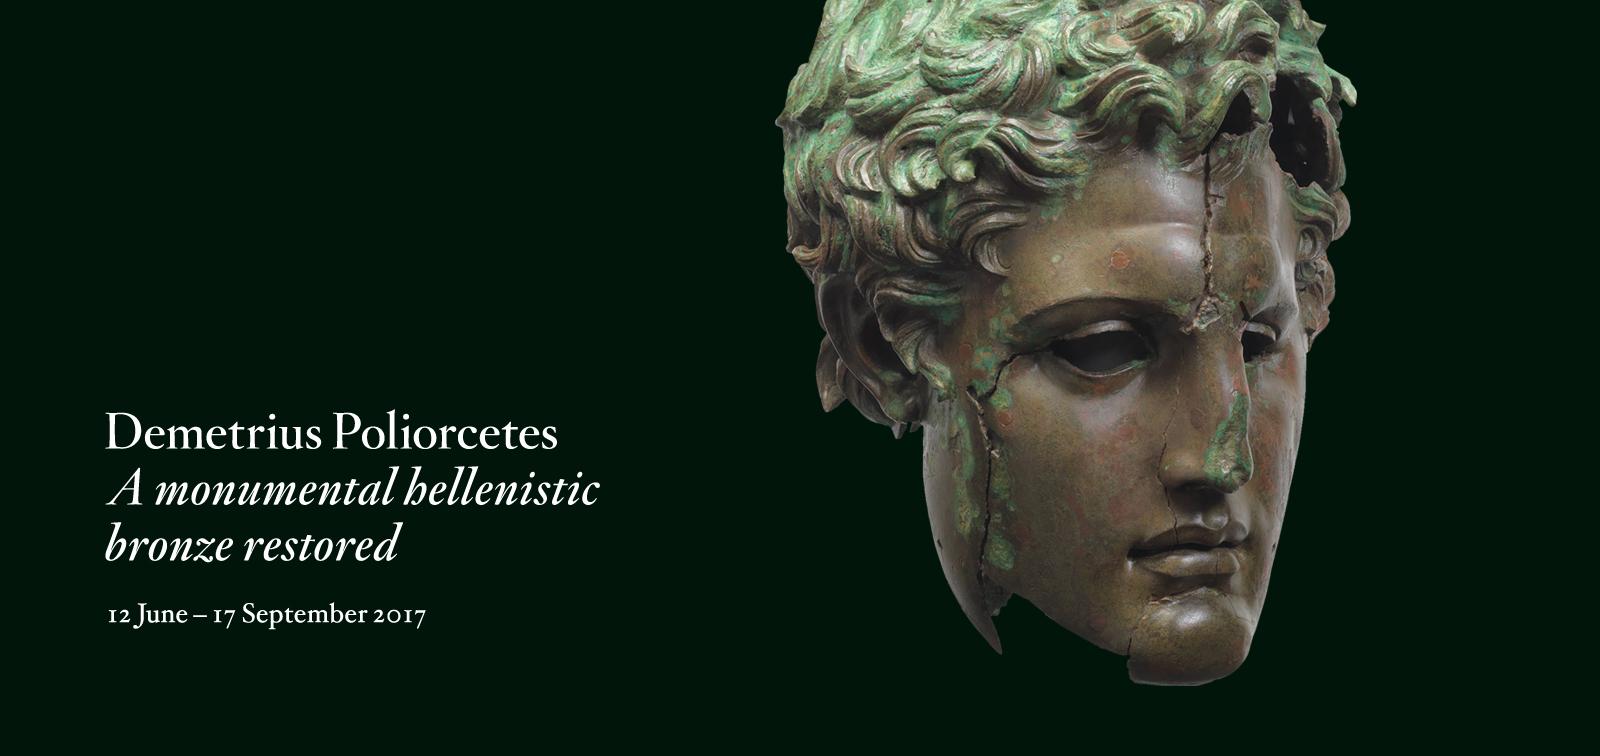 Exhibition. Demetrius Poliorcetes. The restoration of a monumental Hellenistic bronze